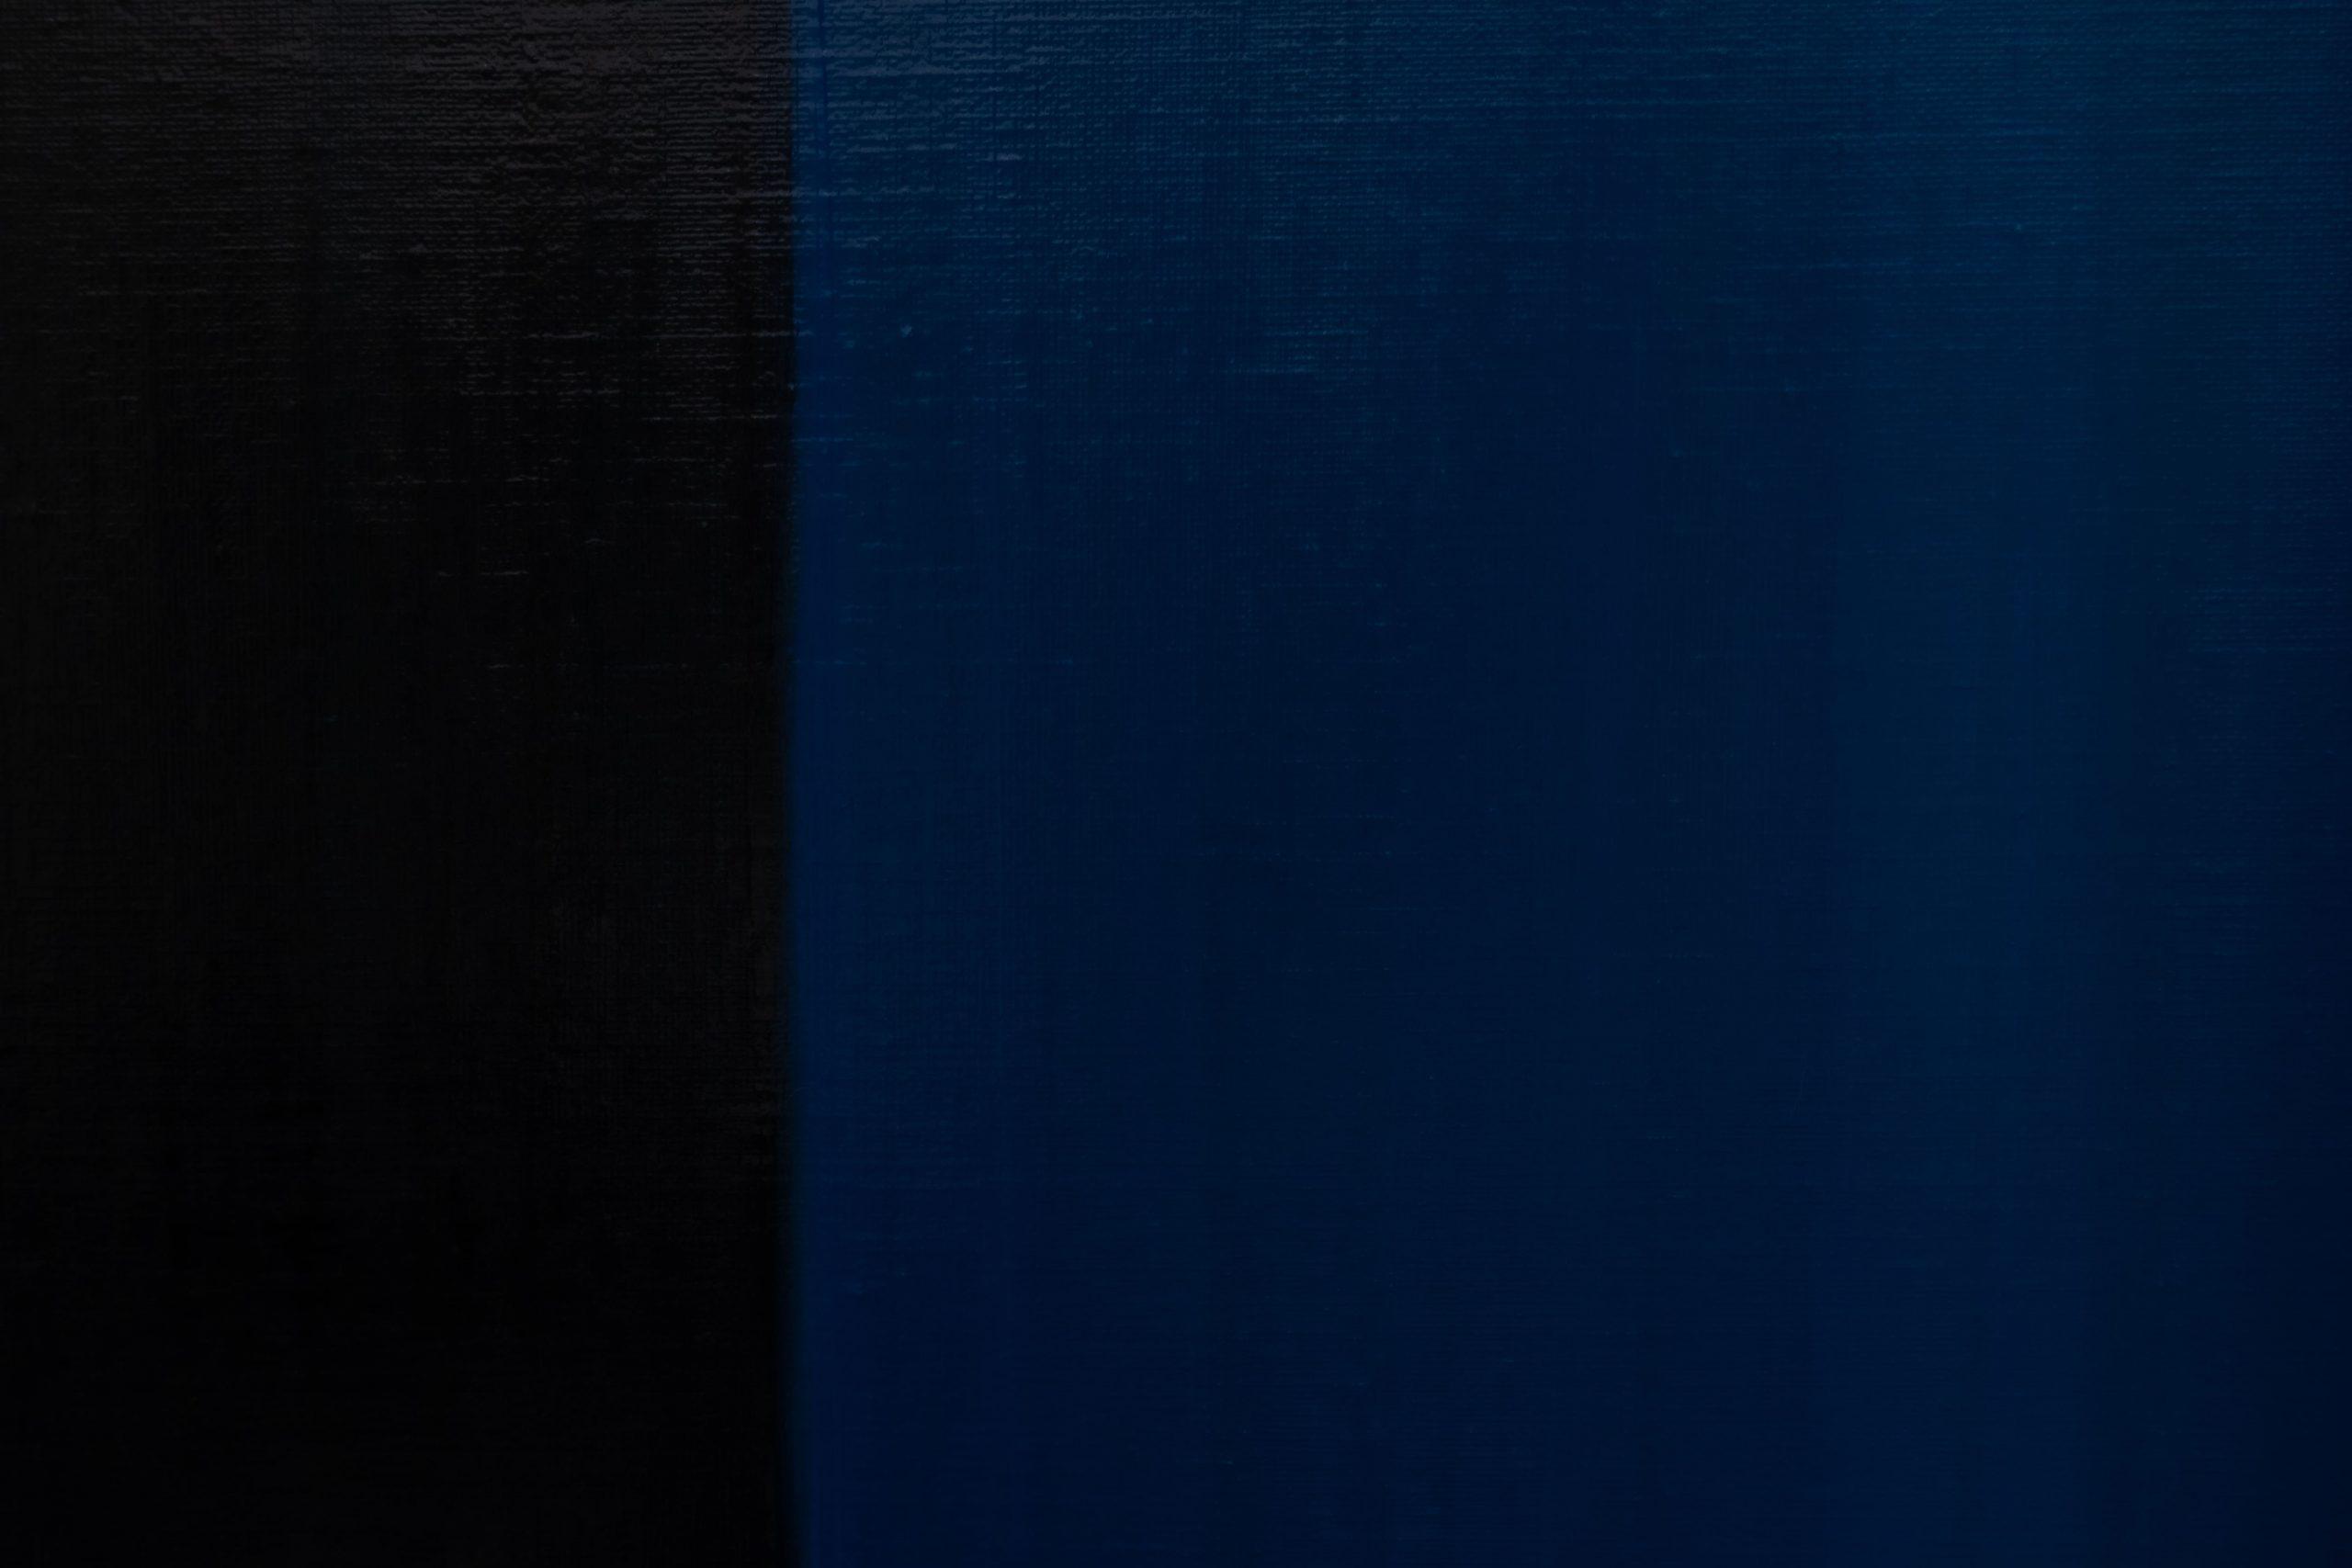 Philosophy-2 イデオロギーとカタルシス、そして私は絵画と鑑賞者の境界へ往く